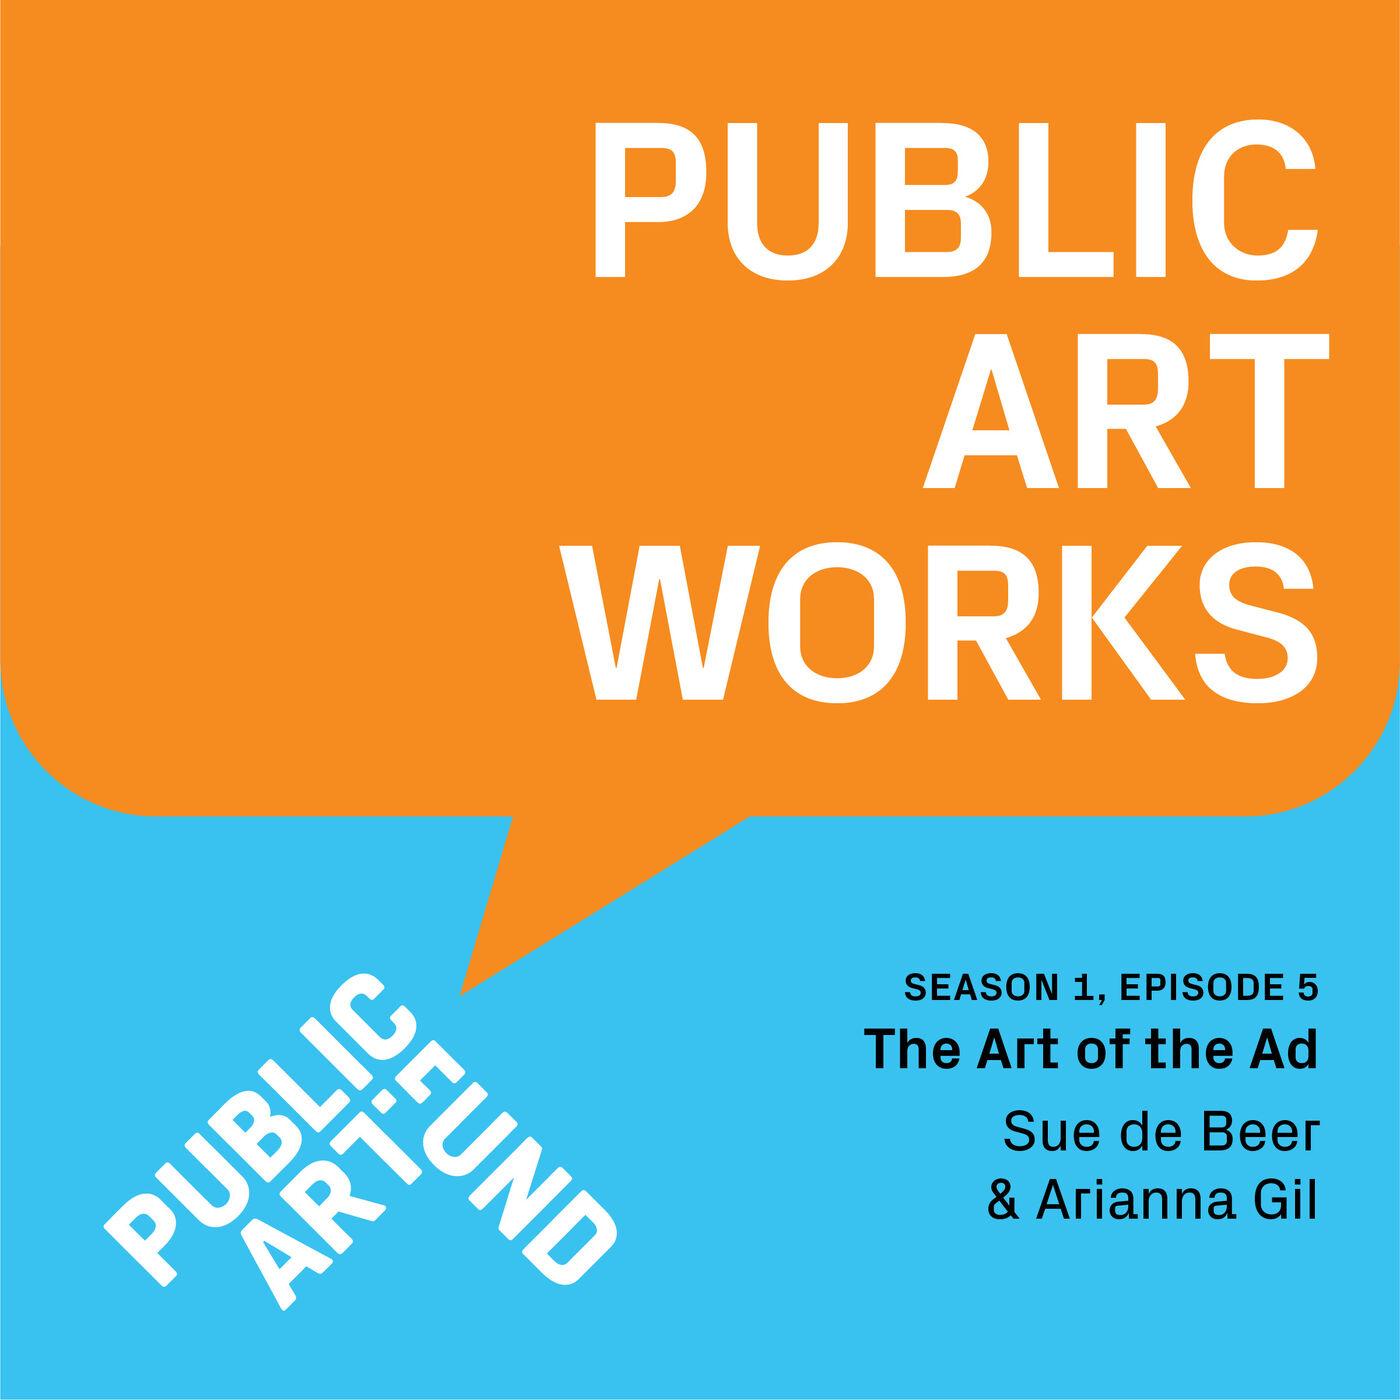 Public Art Works